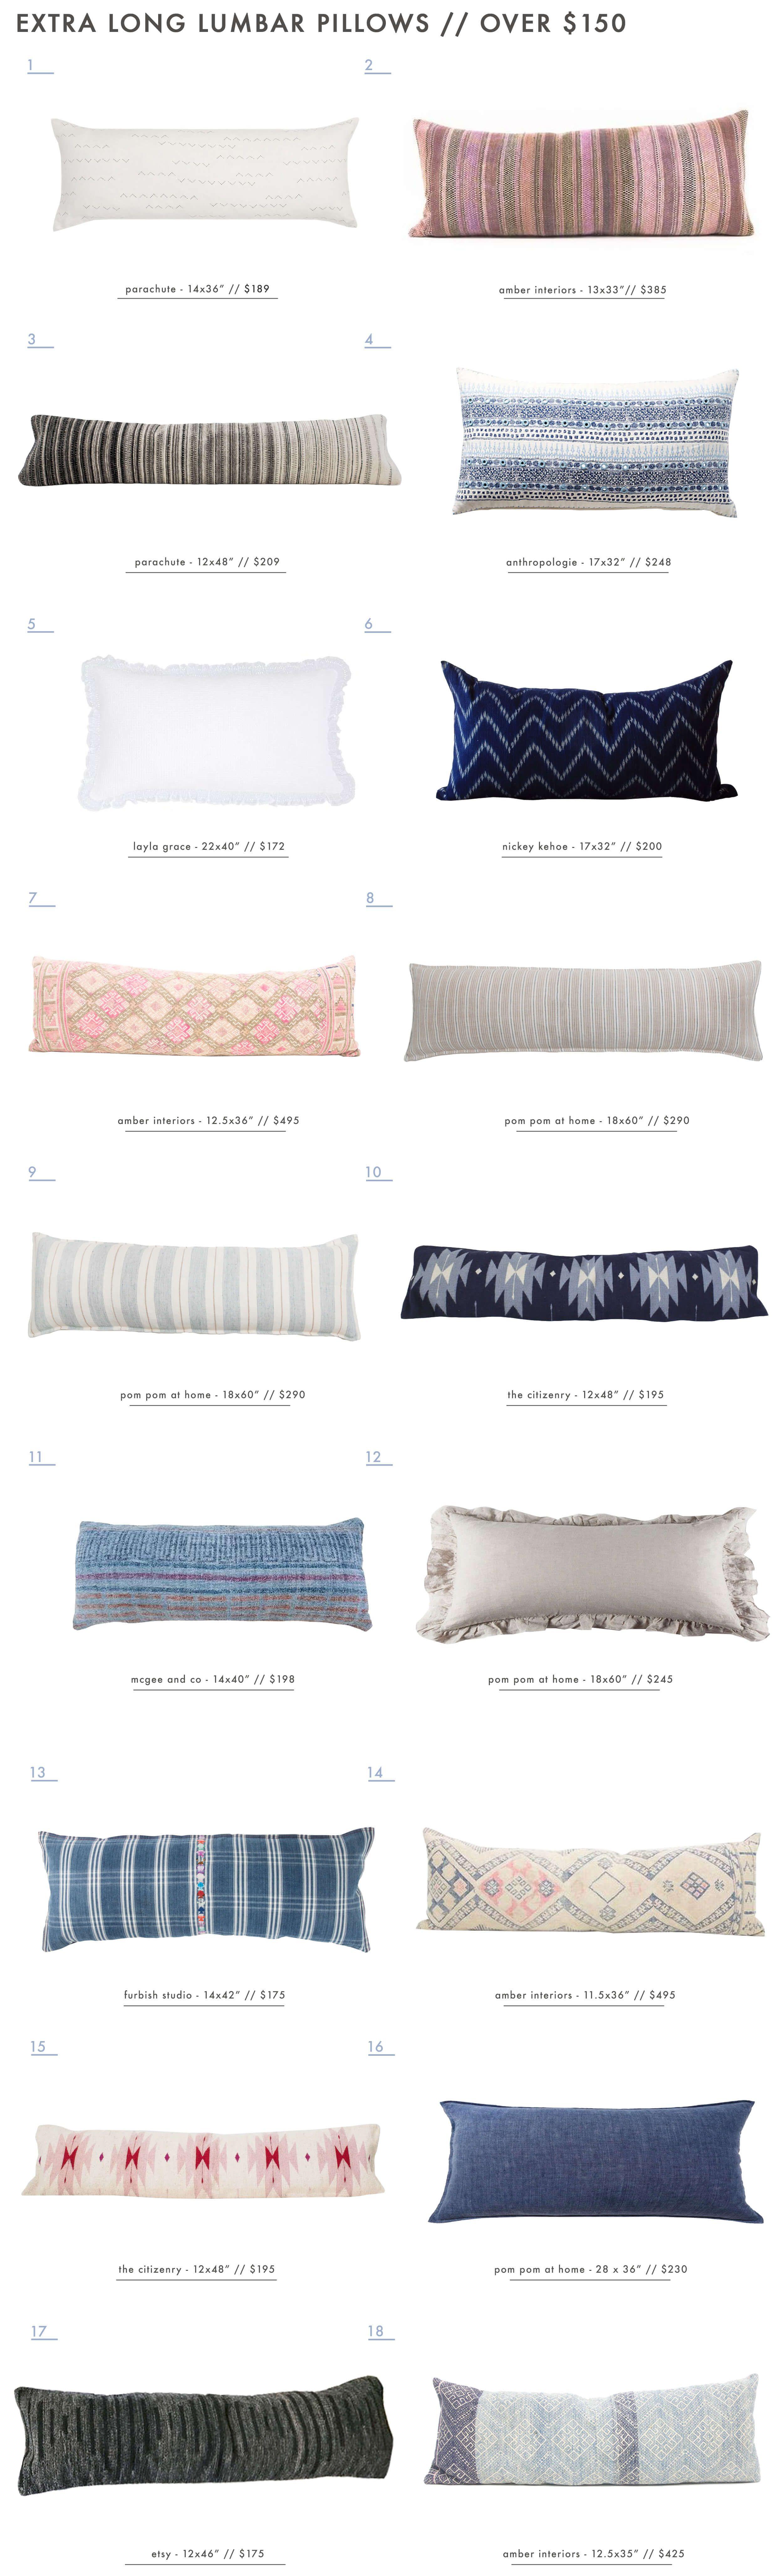 Our Extra Long Lumbar Pillow Roundup | Dormitorio, Para el ...